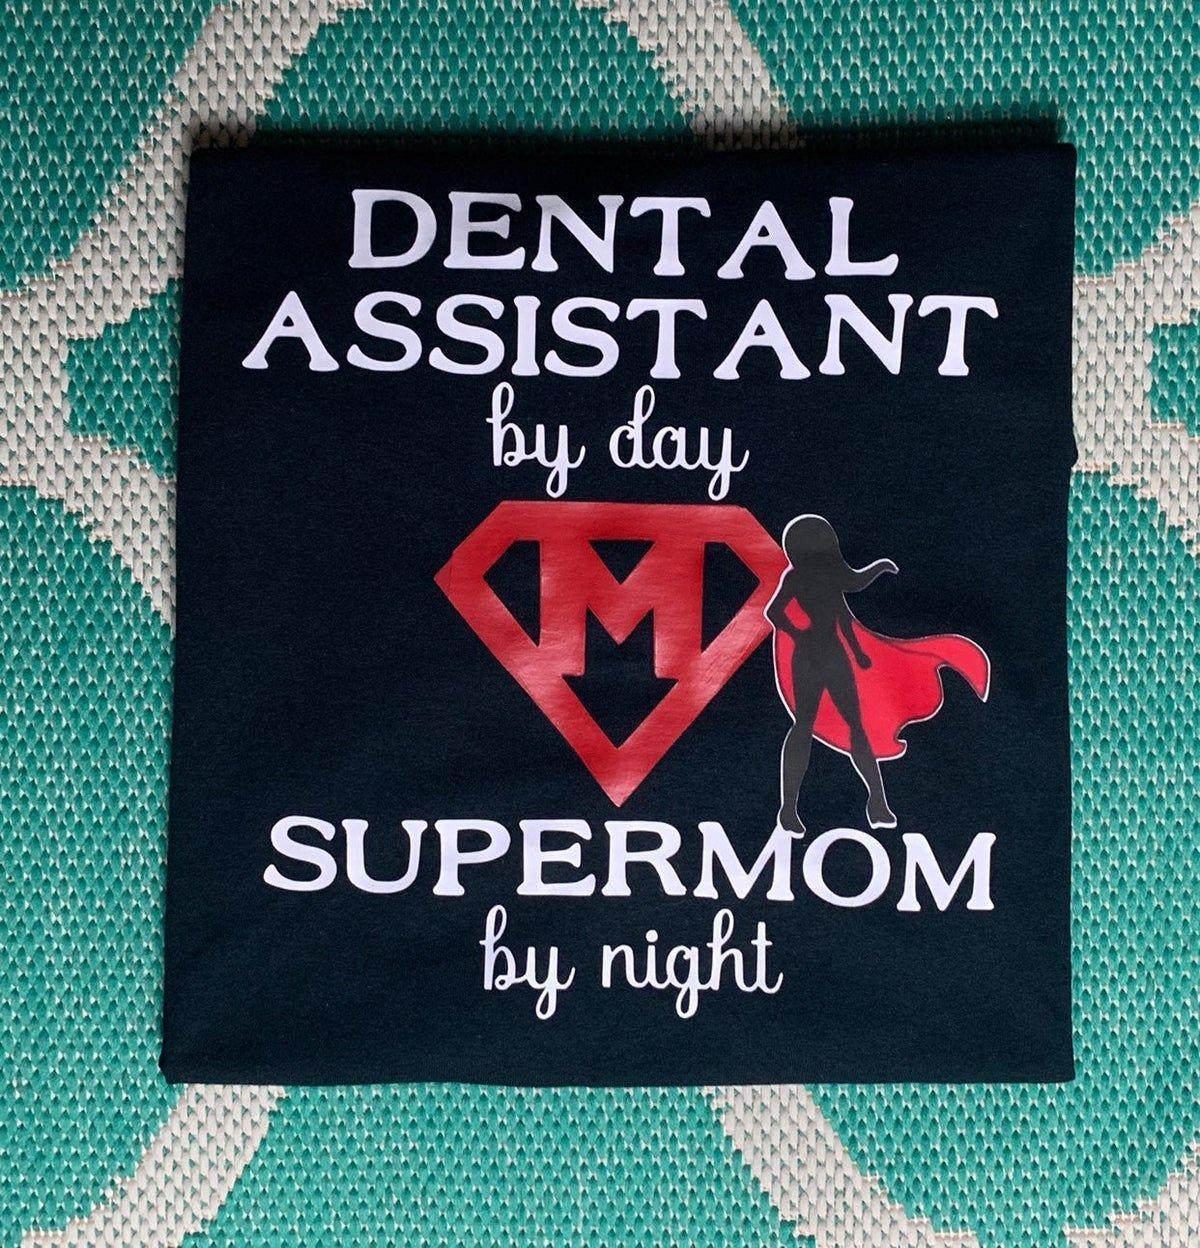 Custom dental assistant shirt dentalassistant mit bildern